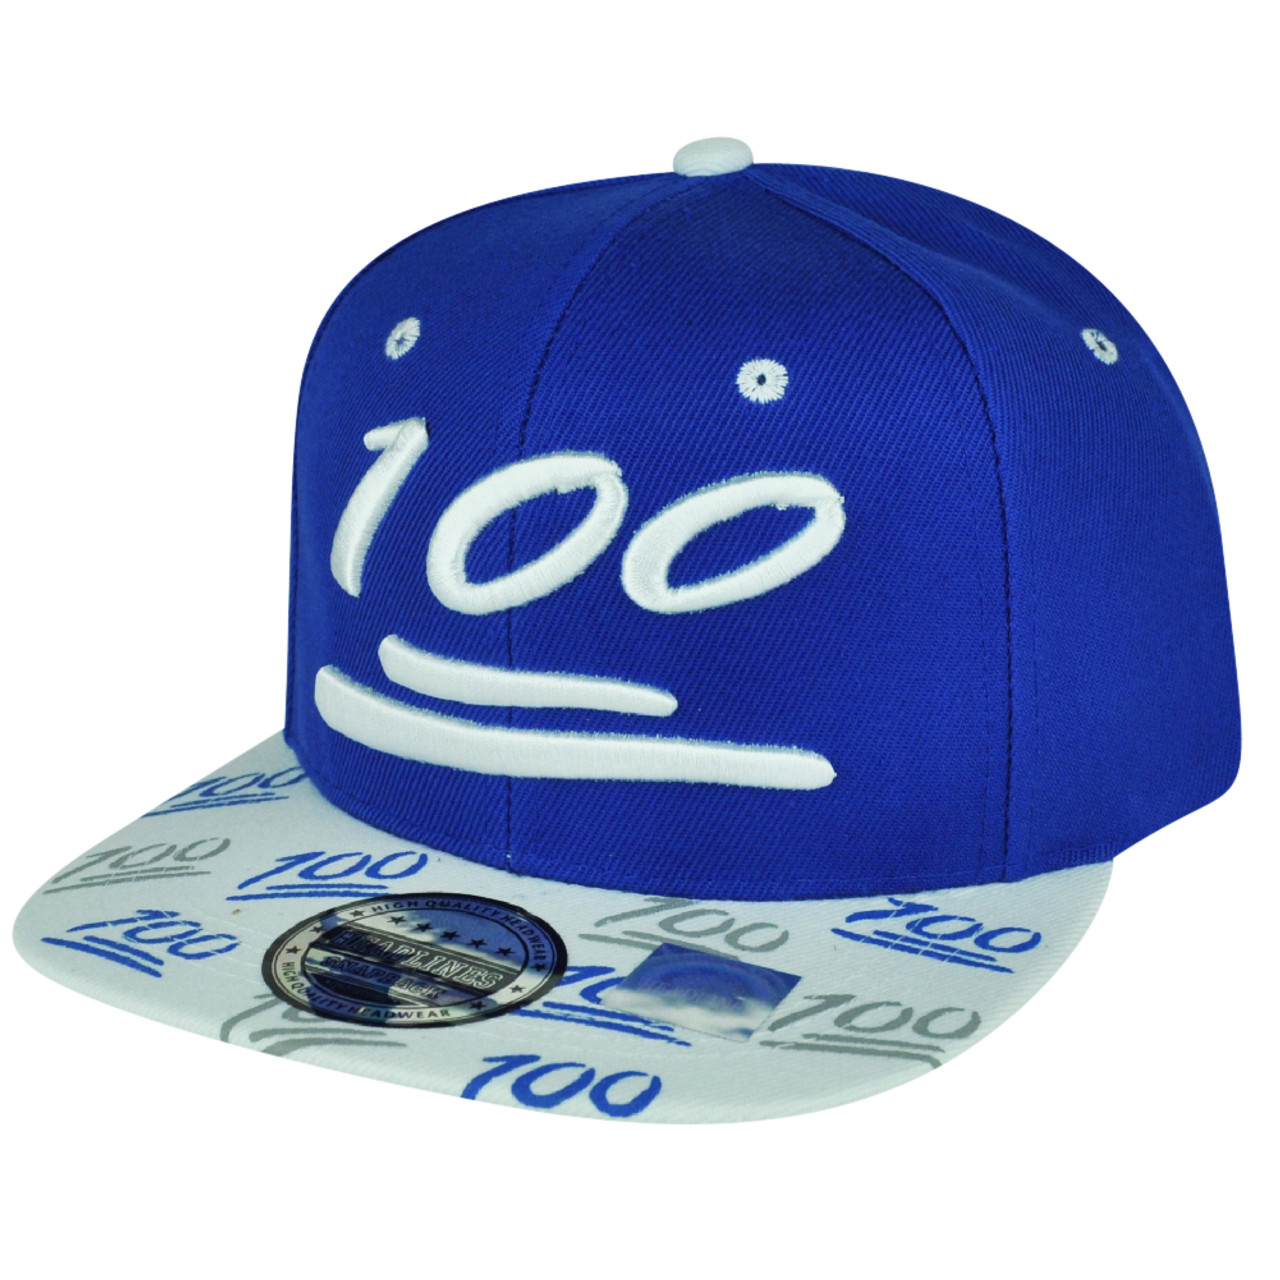 100 One Hundred Snapback Hat Cap Emoji Text Symbol Emoticons Blue